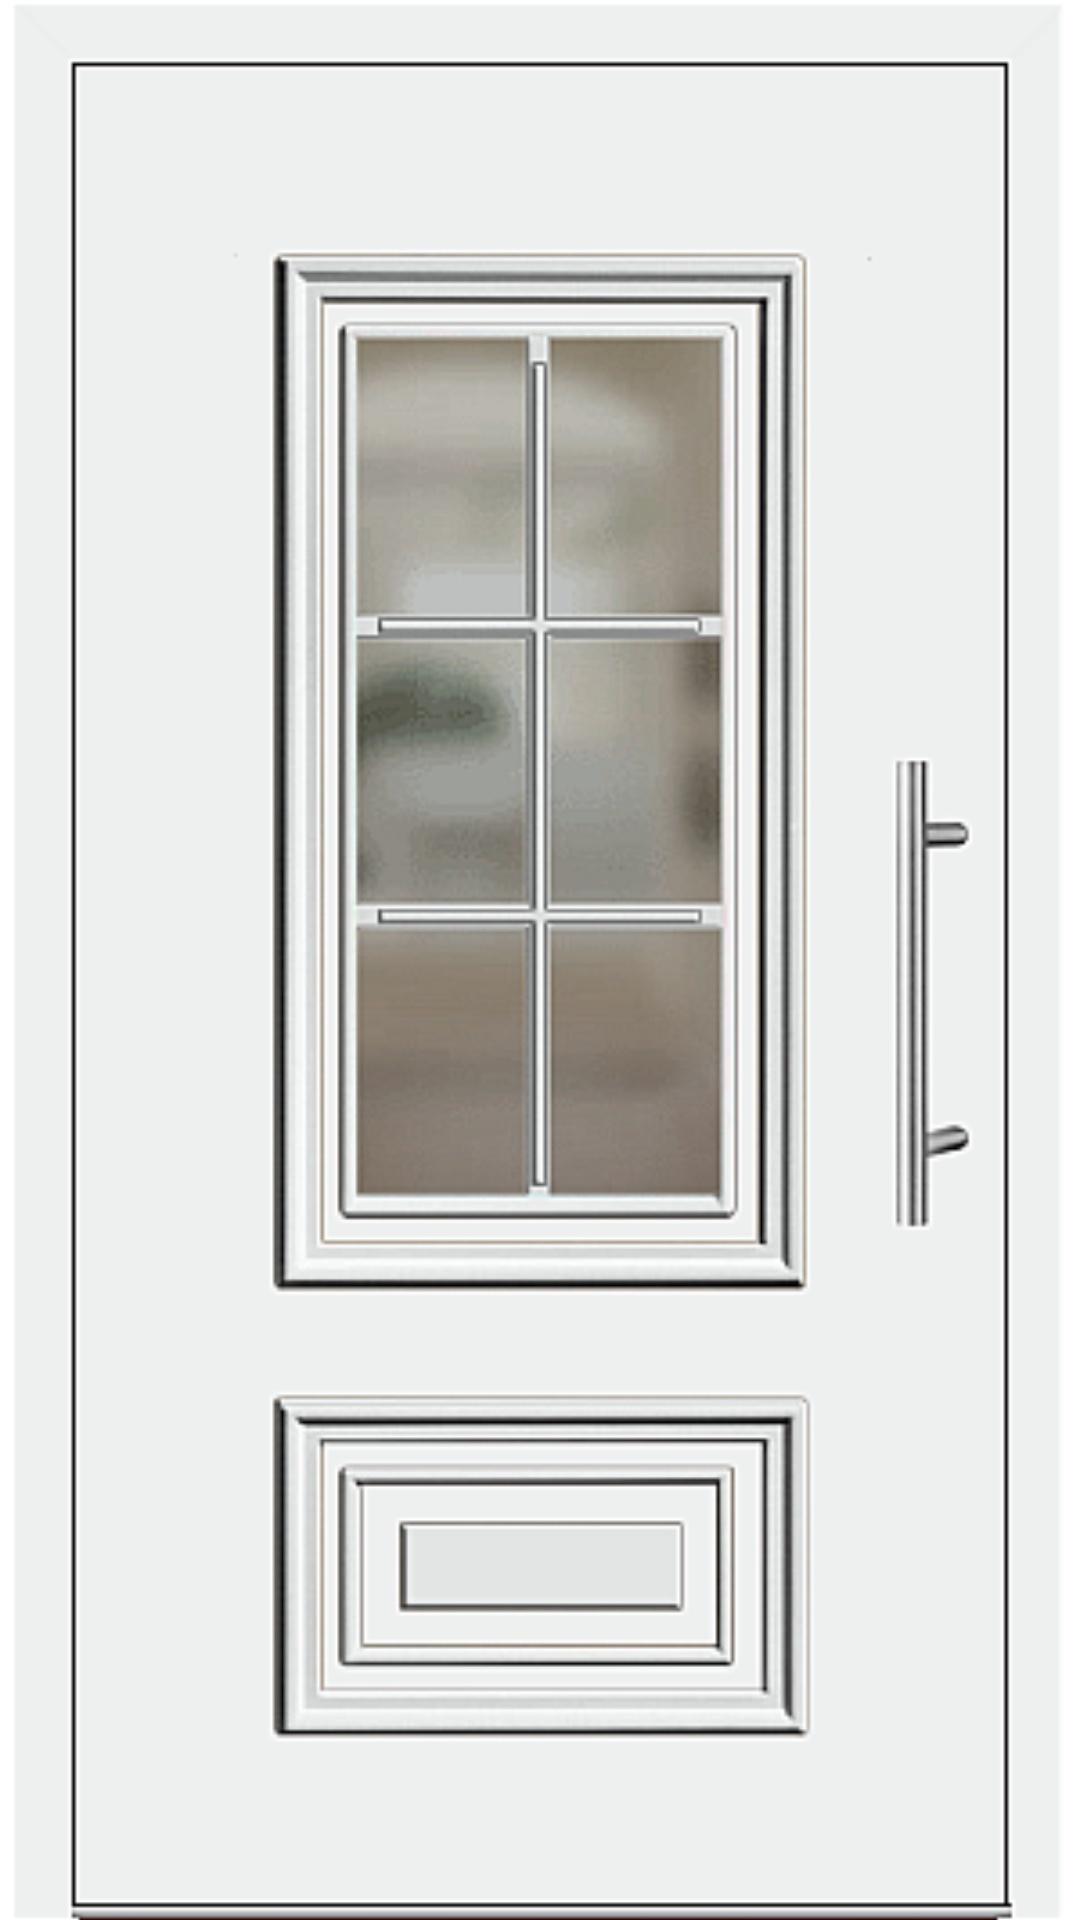 Aluminium Haustür Modell 217-15 weiß